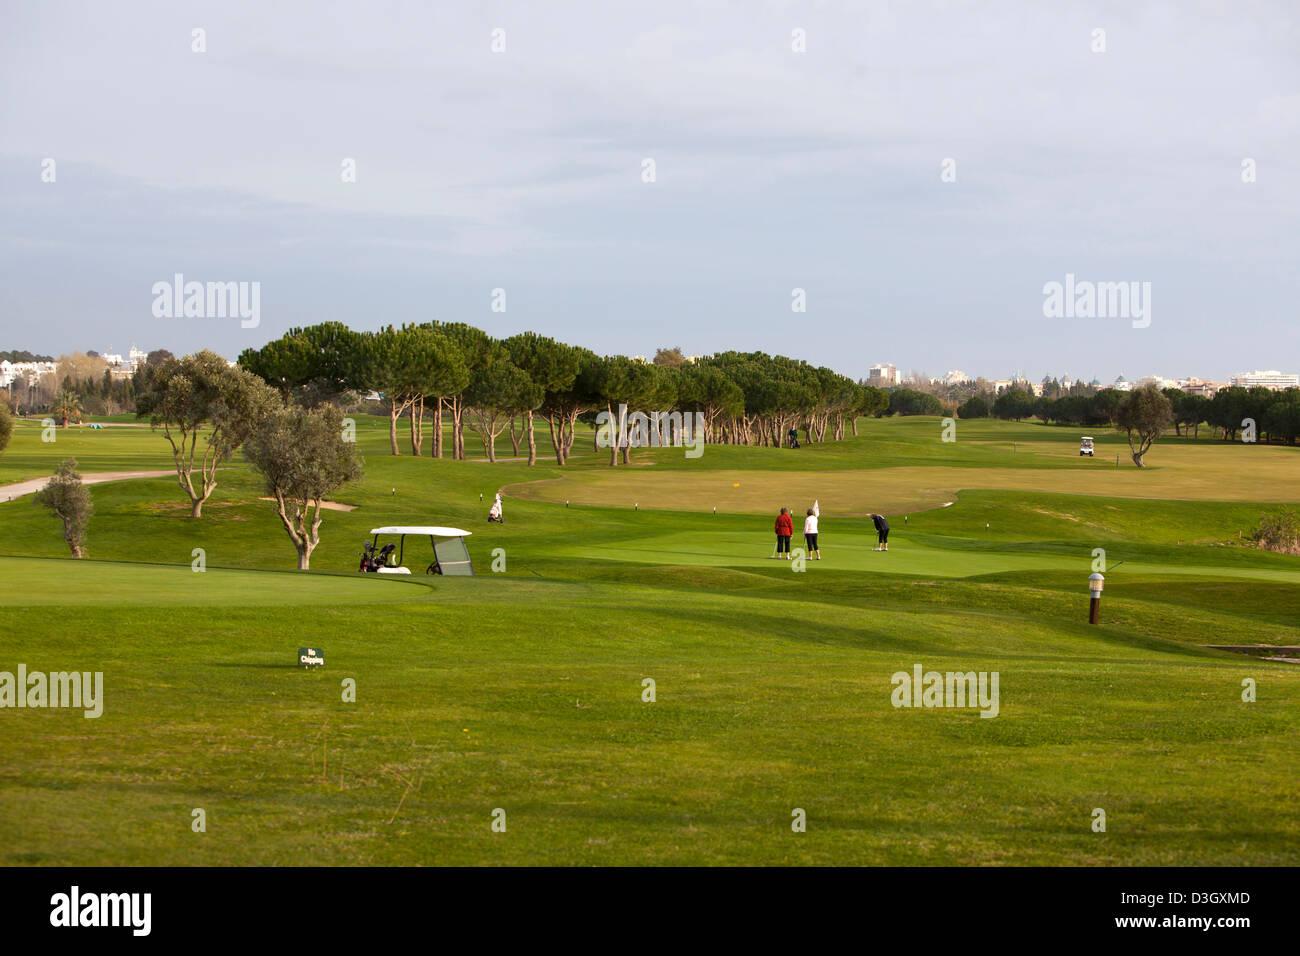 Le parcours de golf Oceânico Laguna, Vilamoura, Portugal. Photo Stock